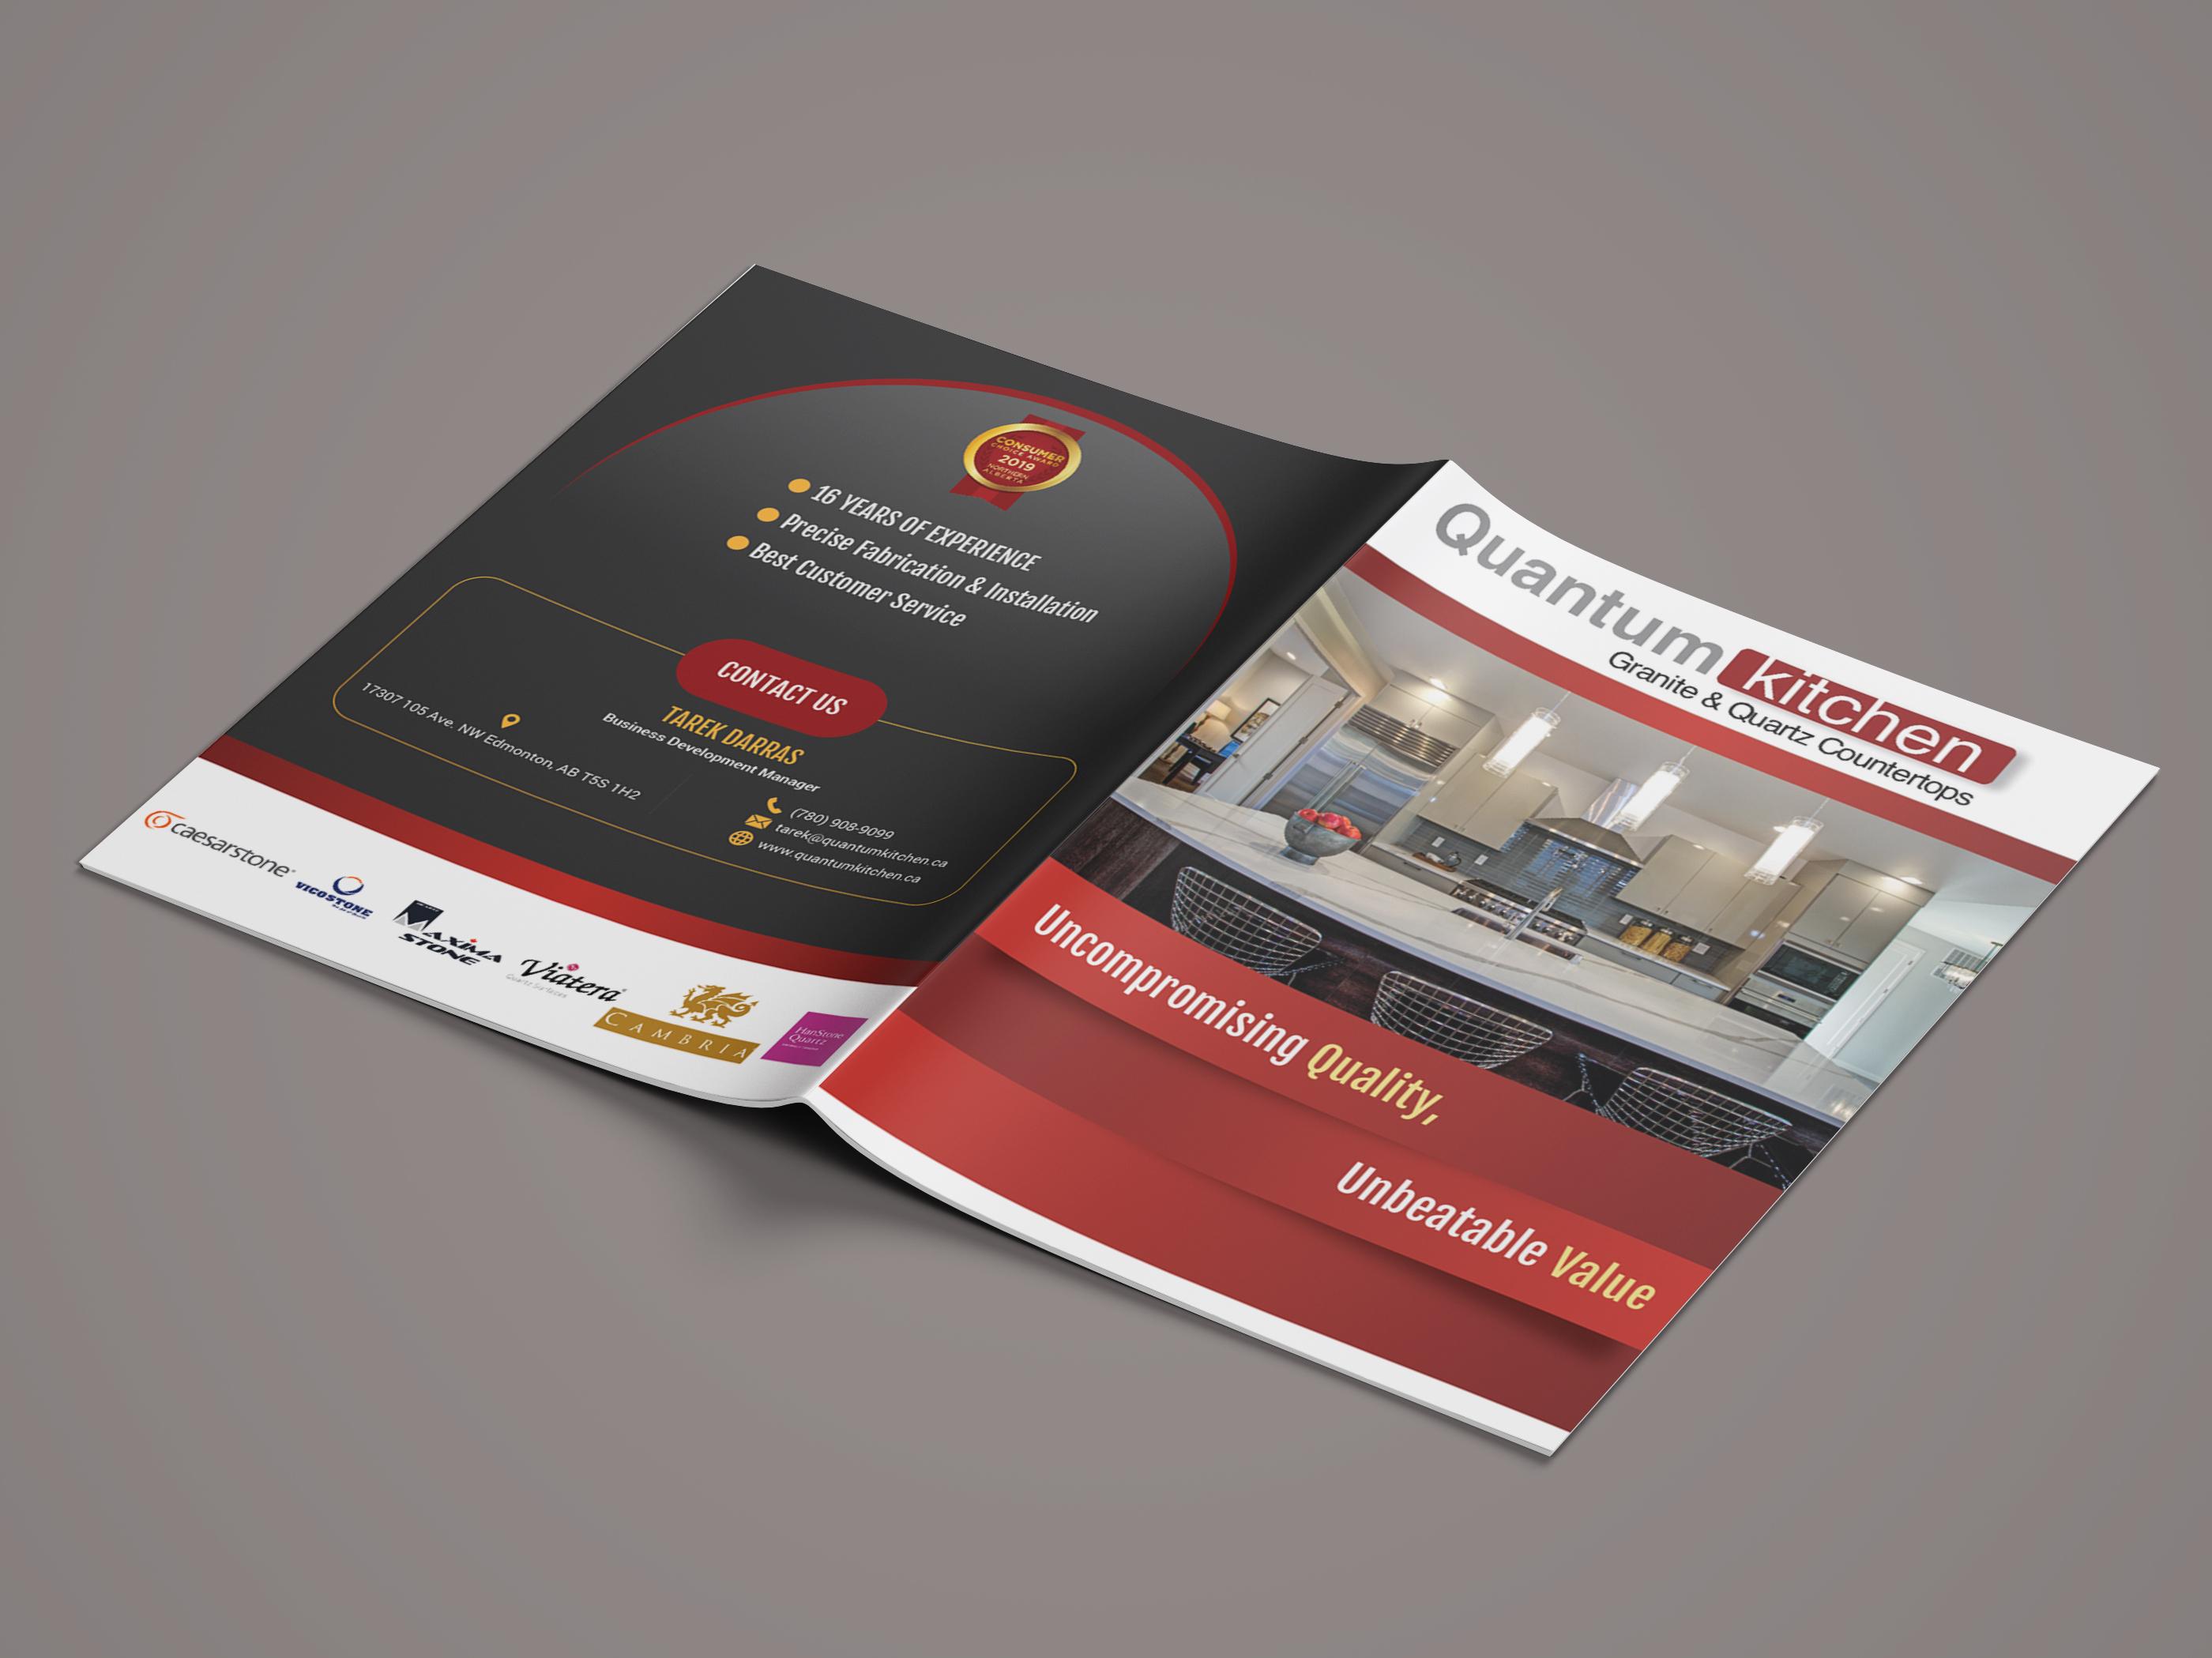 Professional Bifold Brochure Design by Mohibbullah Khandakar Shohag